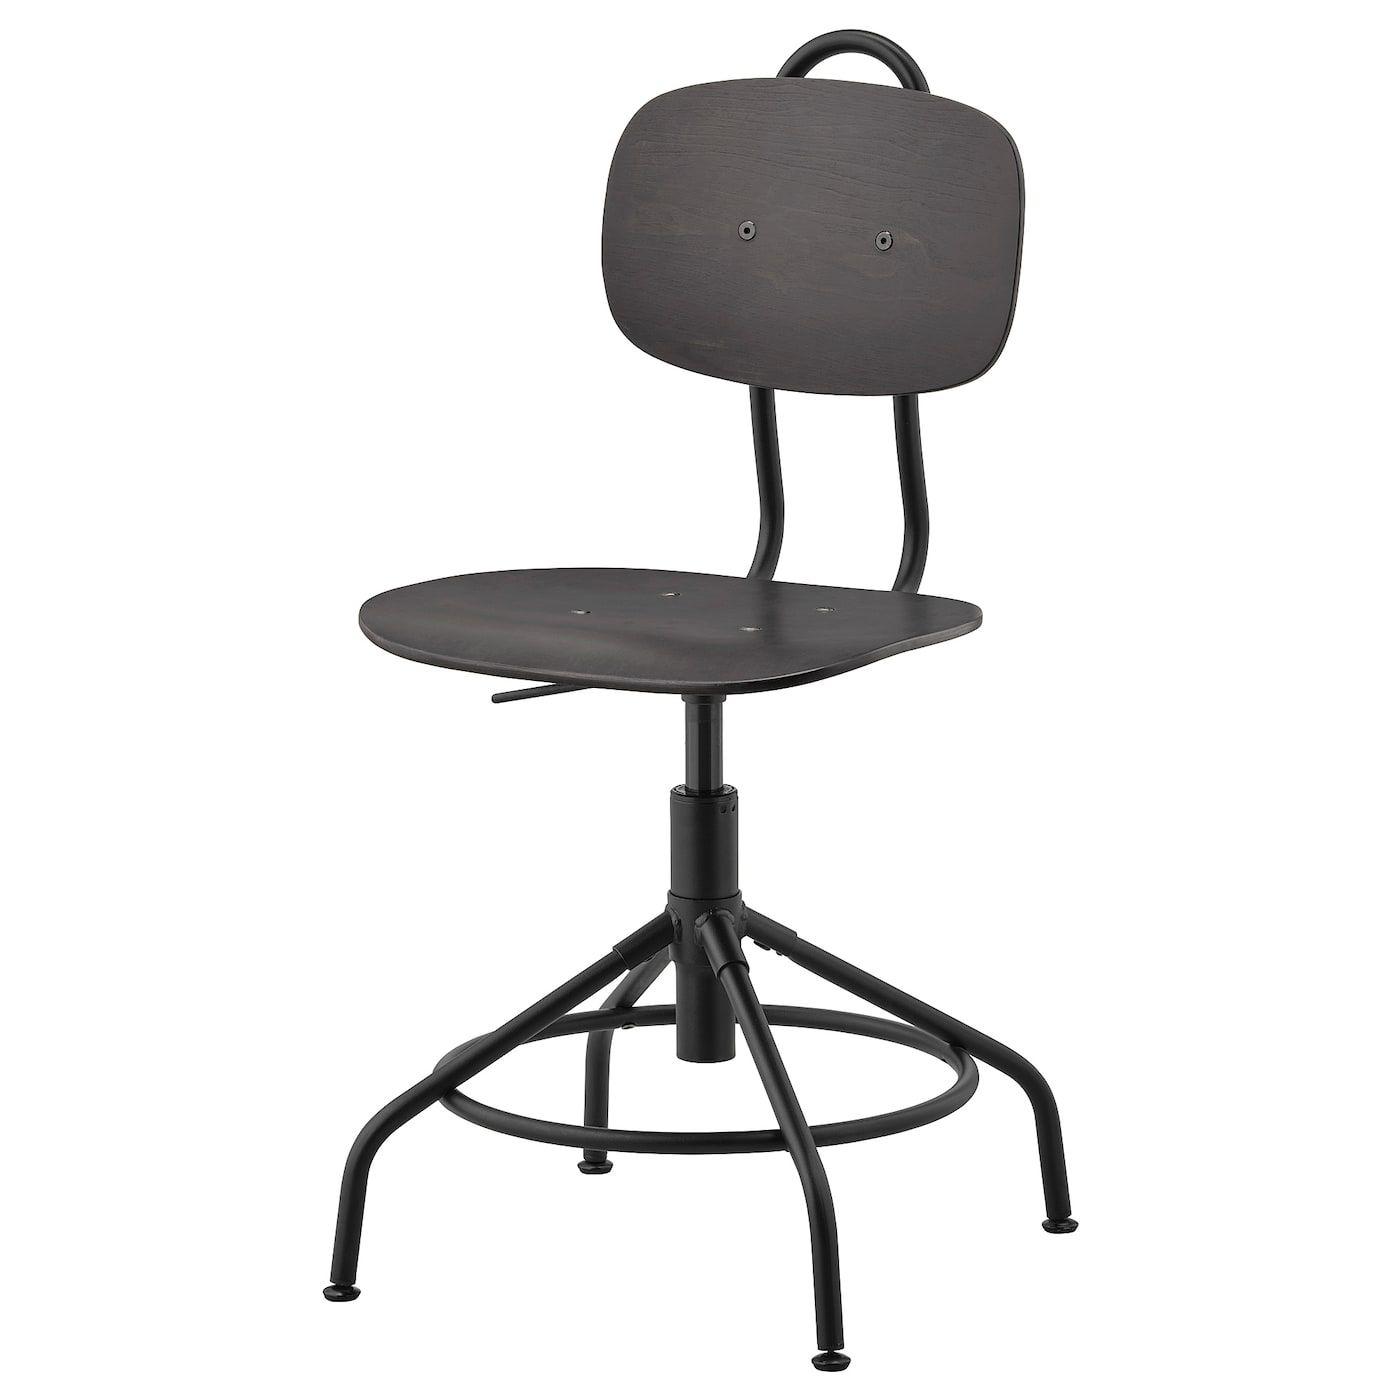 Ikea kullaberg black swivel chair swivel chair chair ikea